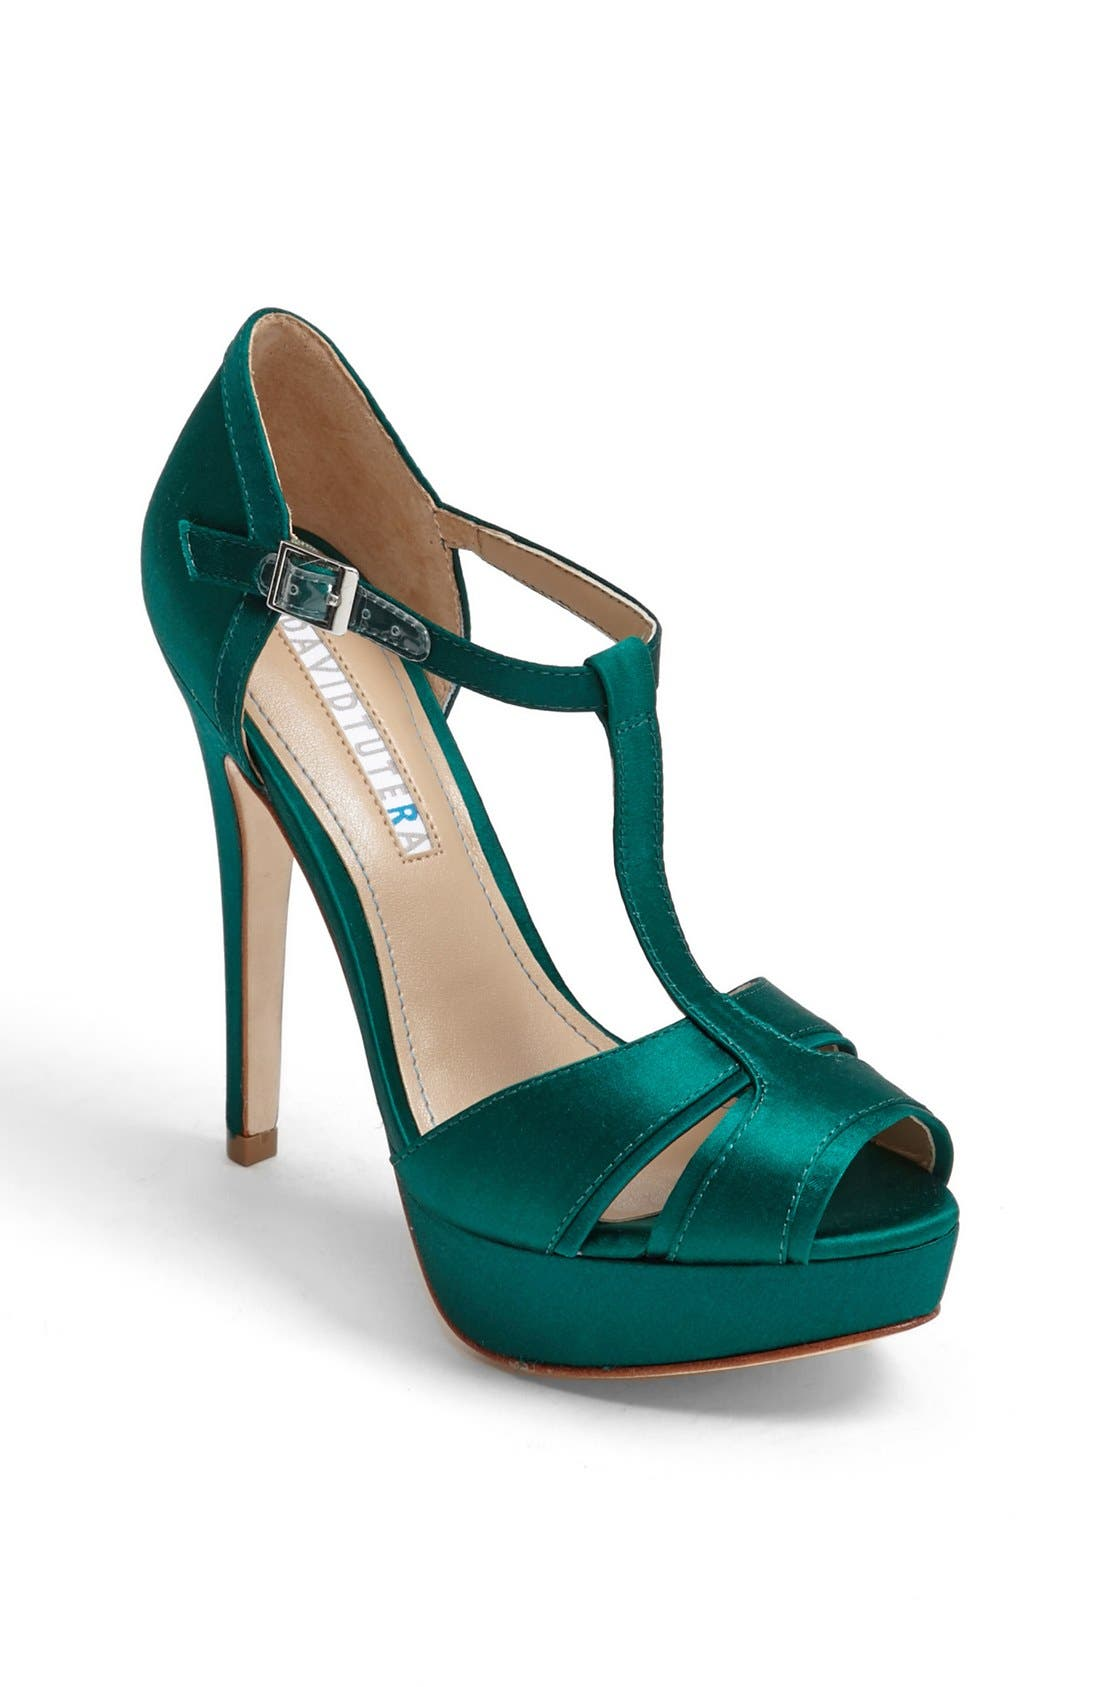 Main Image - David Tutera 'Joy' Sandal (Online Only Color)